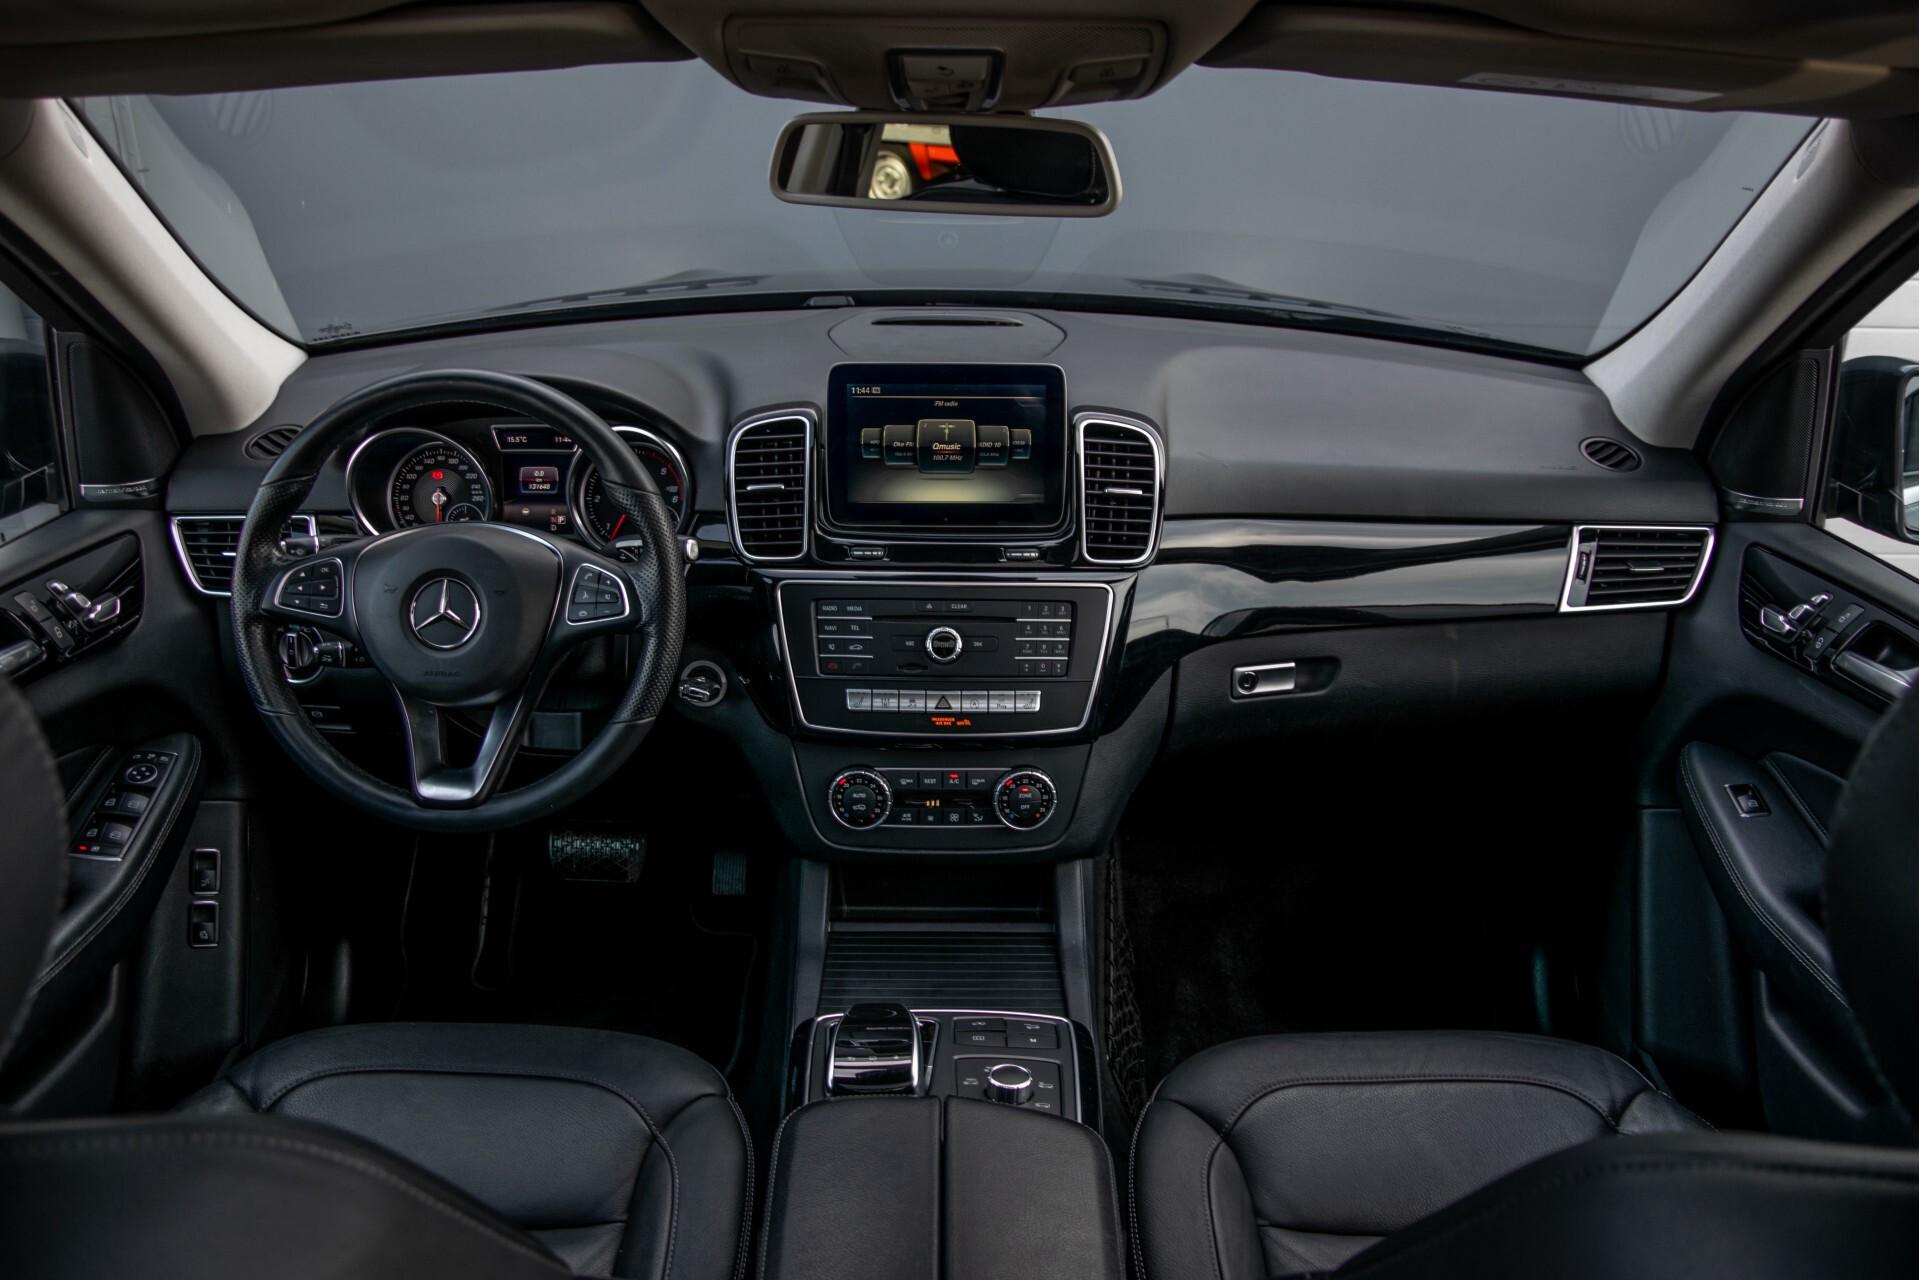 Mercedes-Benz GLE 350 d 4-M AMG Active Curve System/Panorama/Standkachel/Harman-Kardon/Trekhaak Aut9 Foto 9